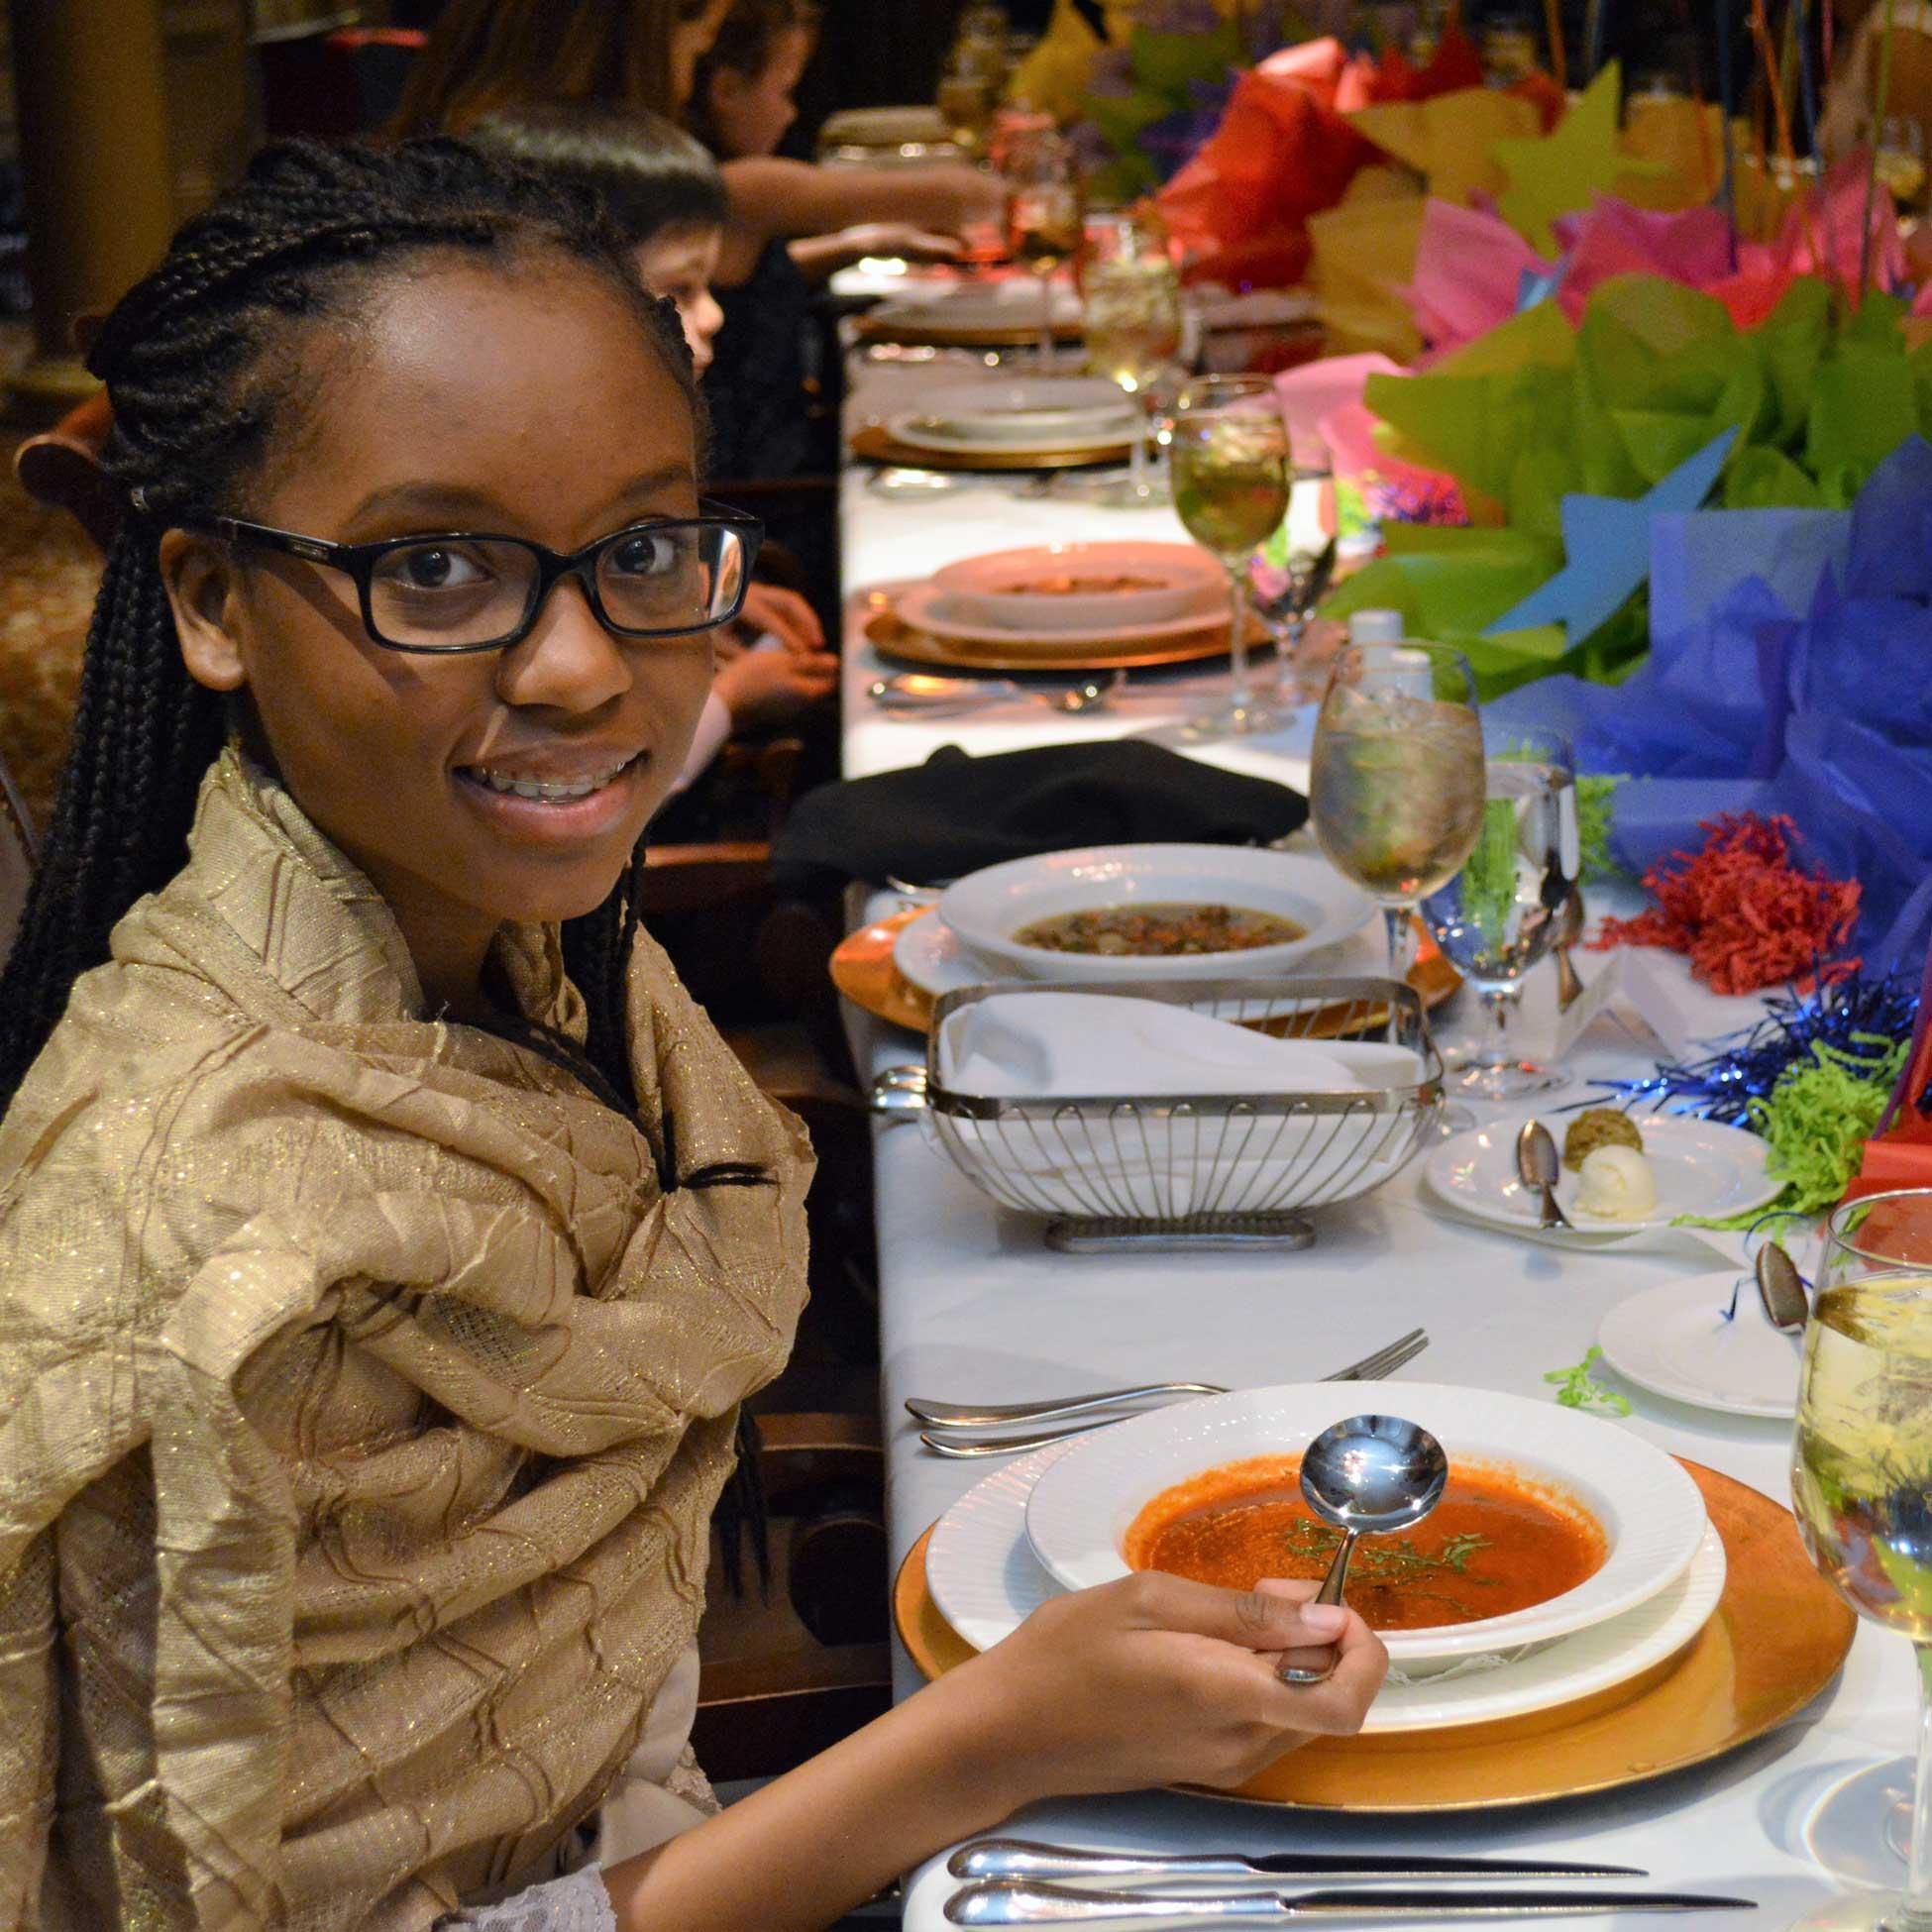 Etiquette Classes For Children And Teens Queen City